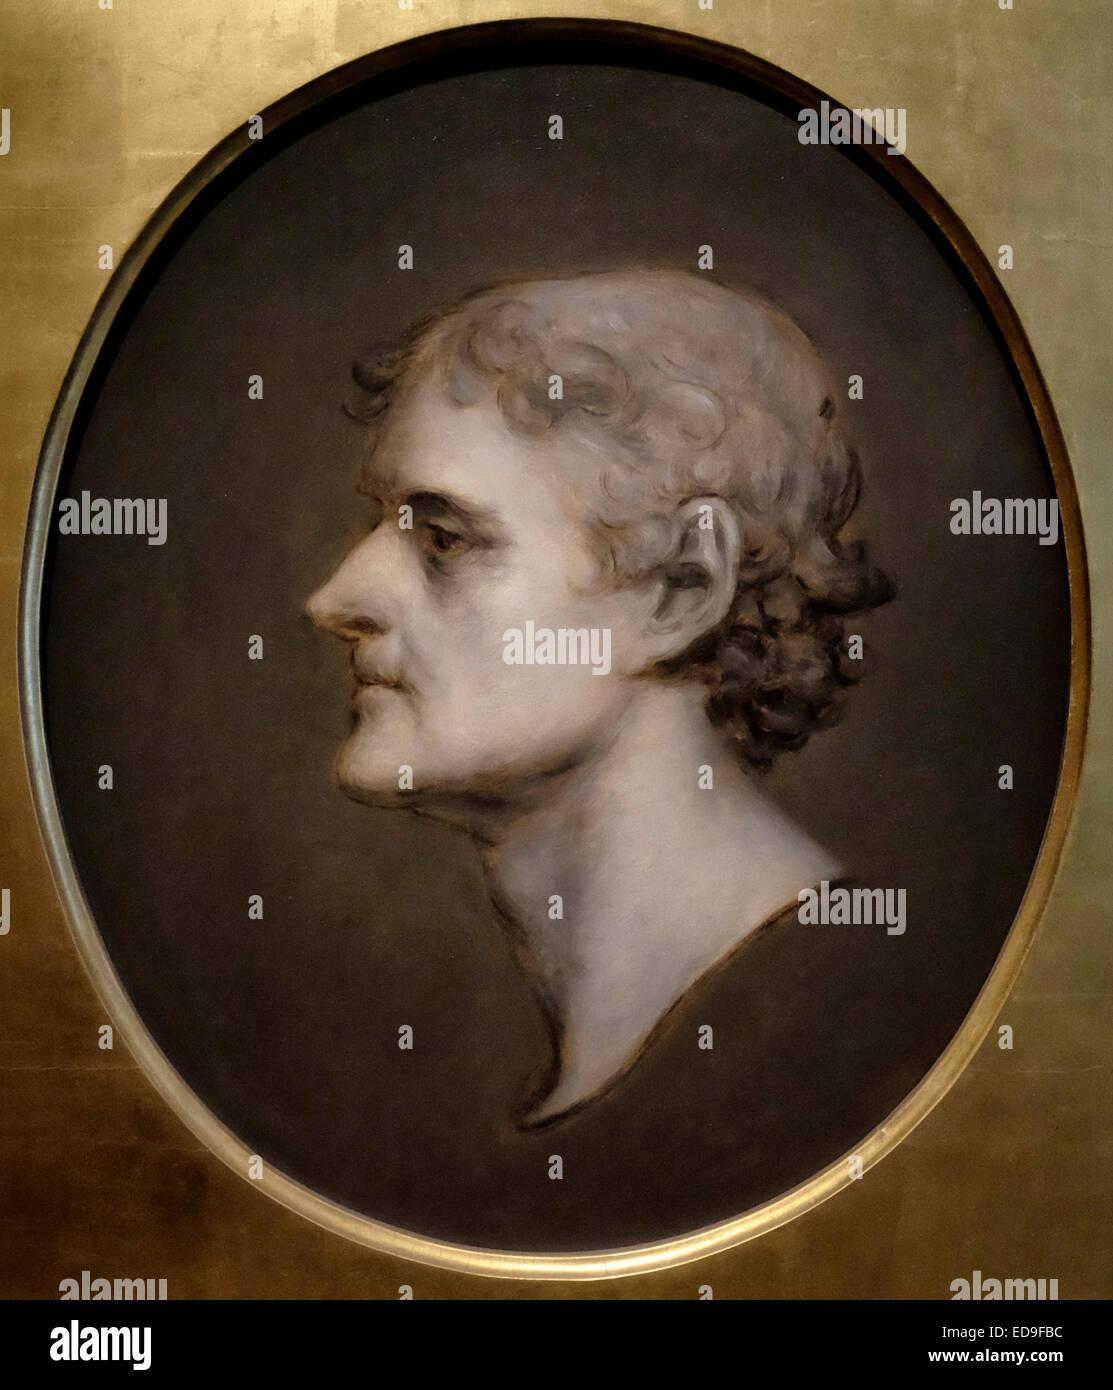 f9fc739fdaa1 President Thomas Jefferson profile portrait - Charles Bird King after  Gilbert Stuart 1836